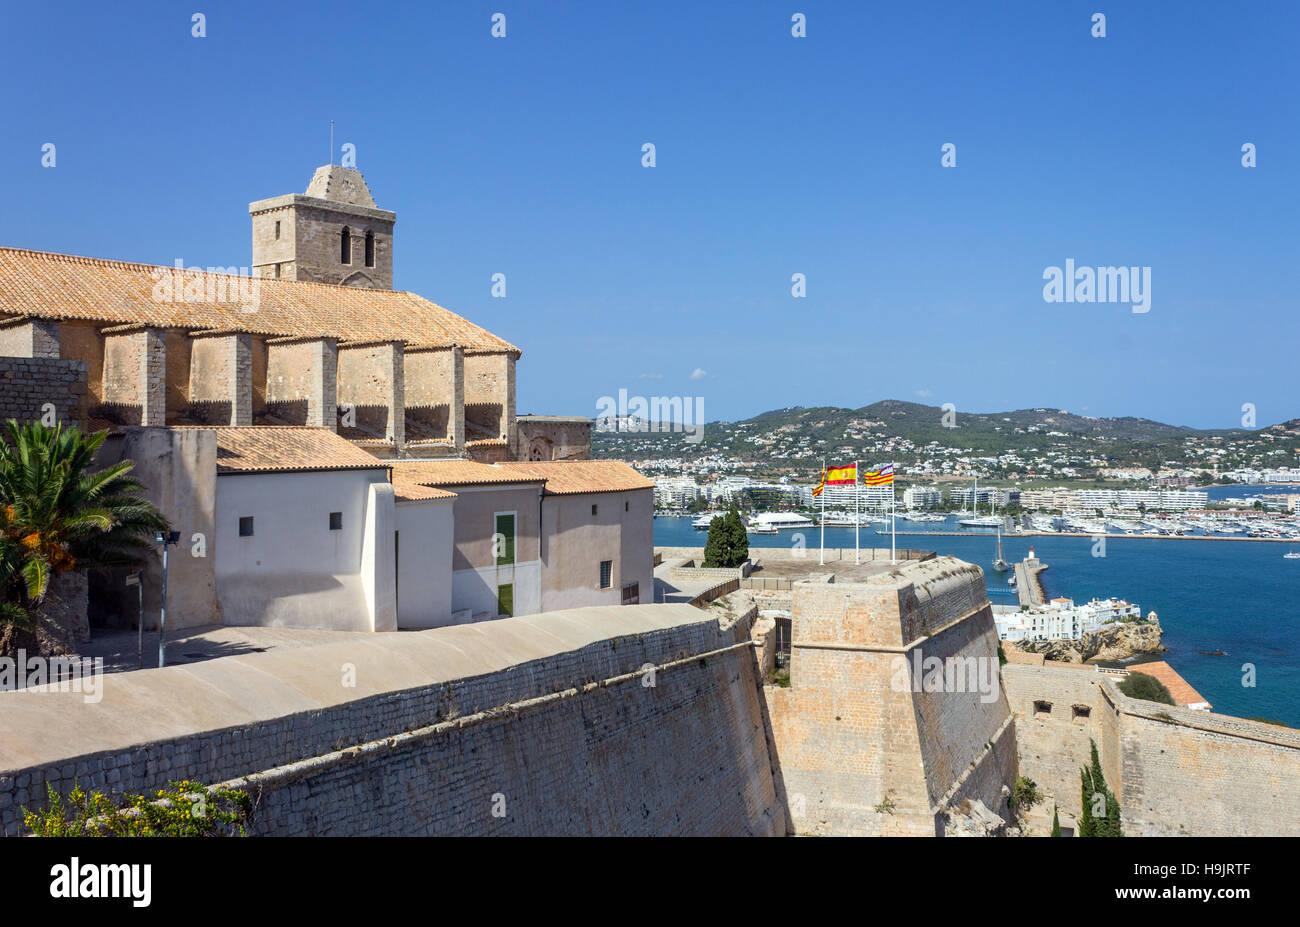 Spain, Balearic Islands, Ibiza, Eivissa, old town Dalt Vila - Stock Image